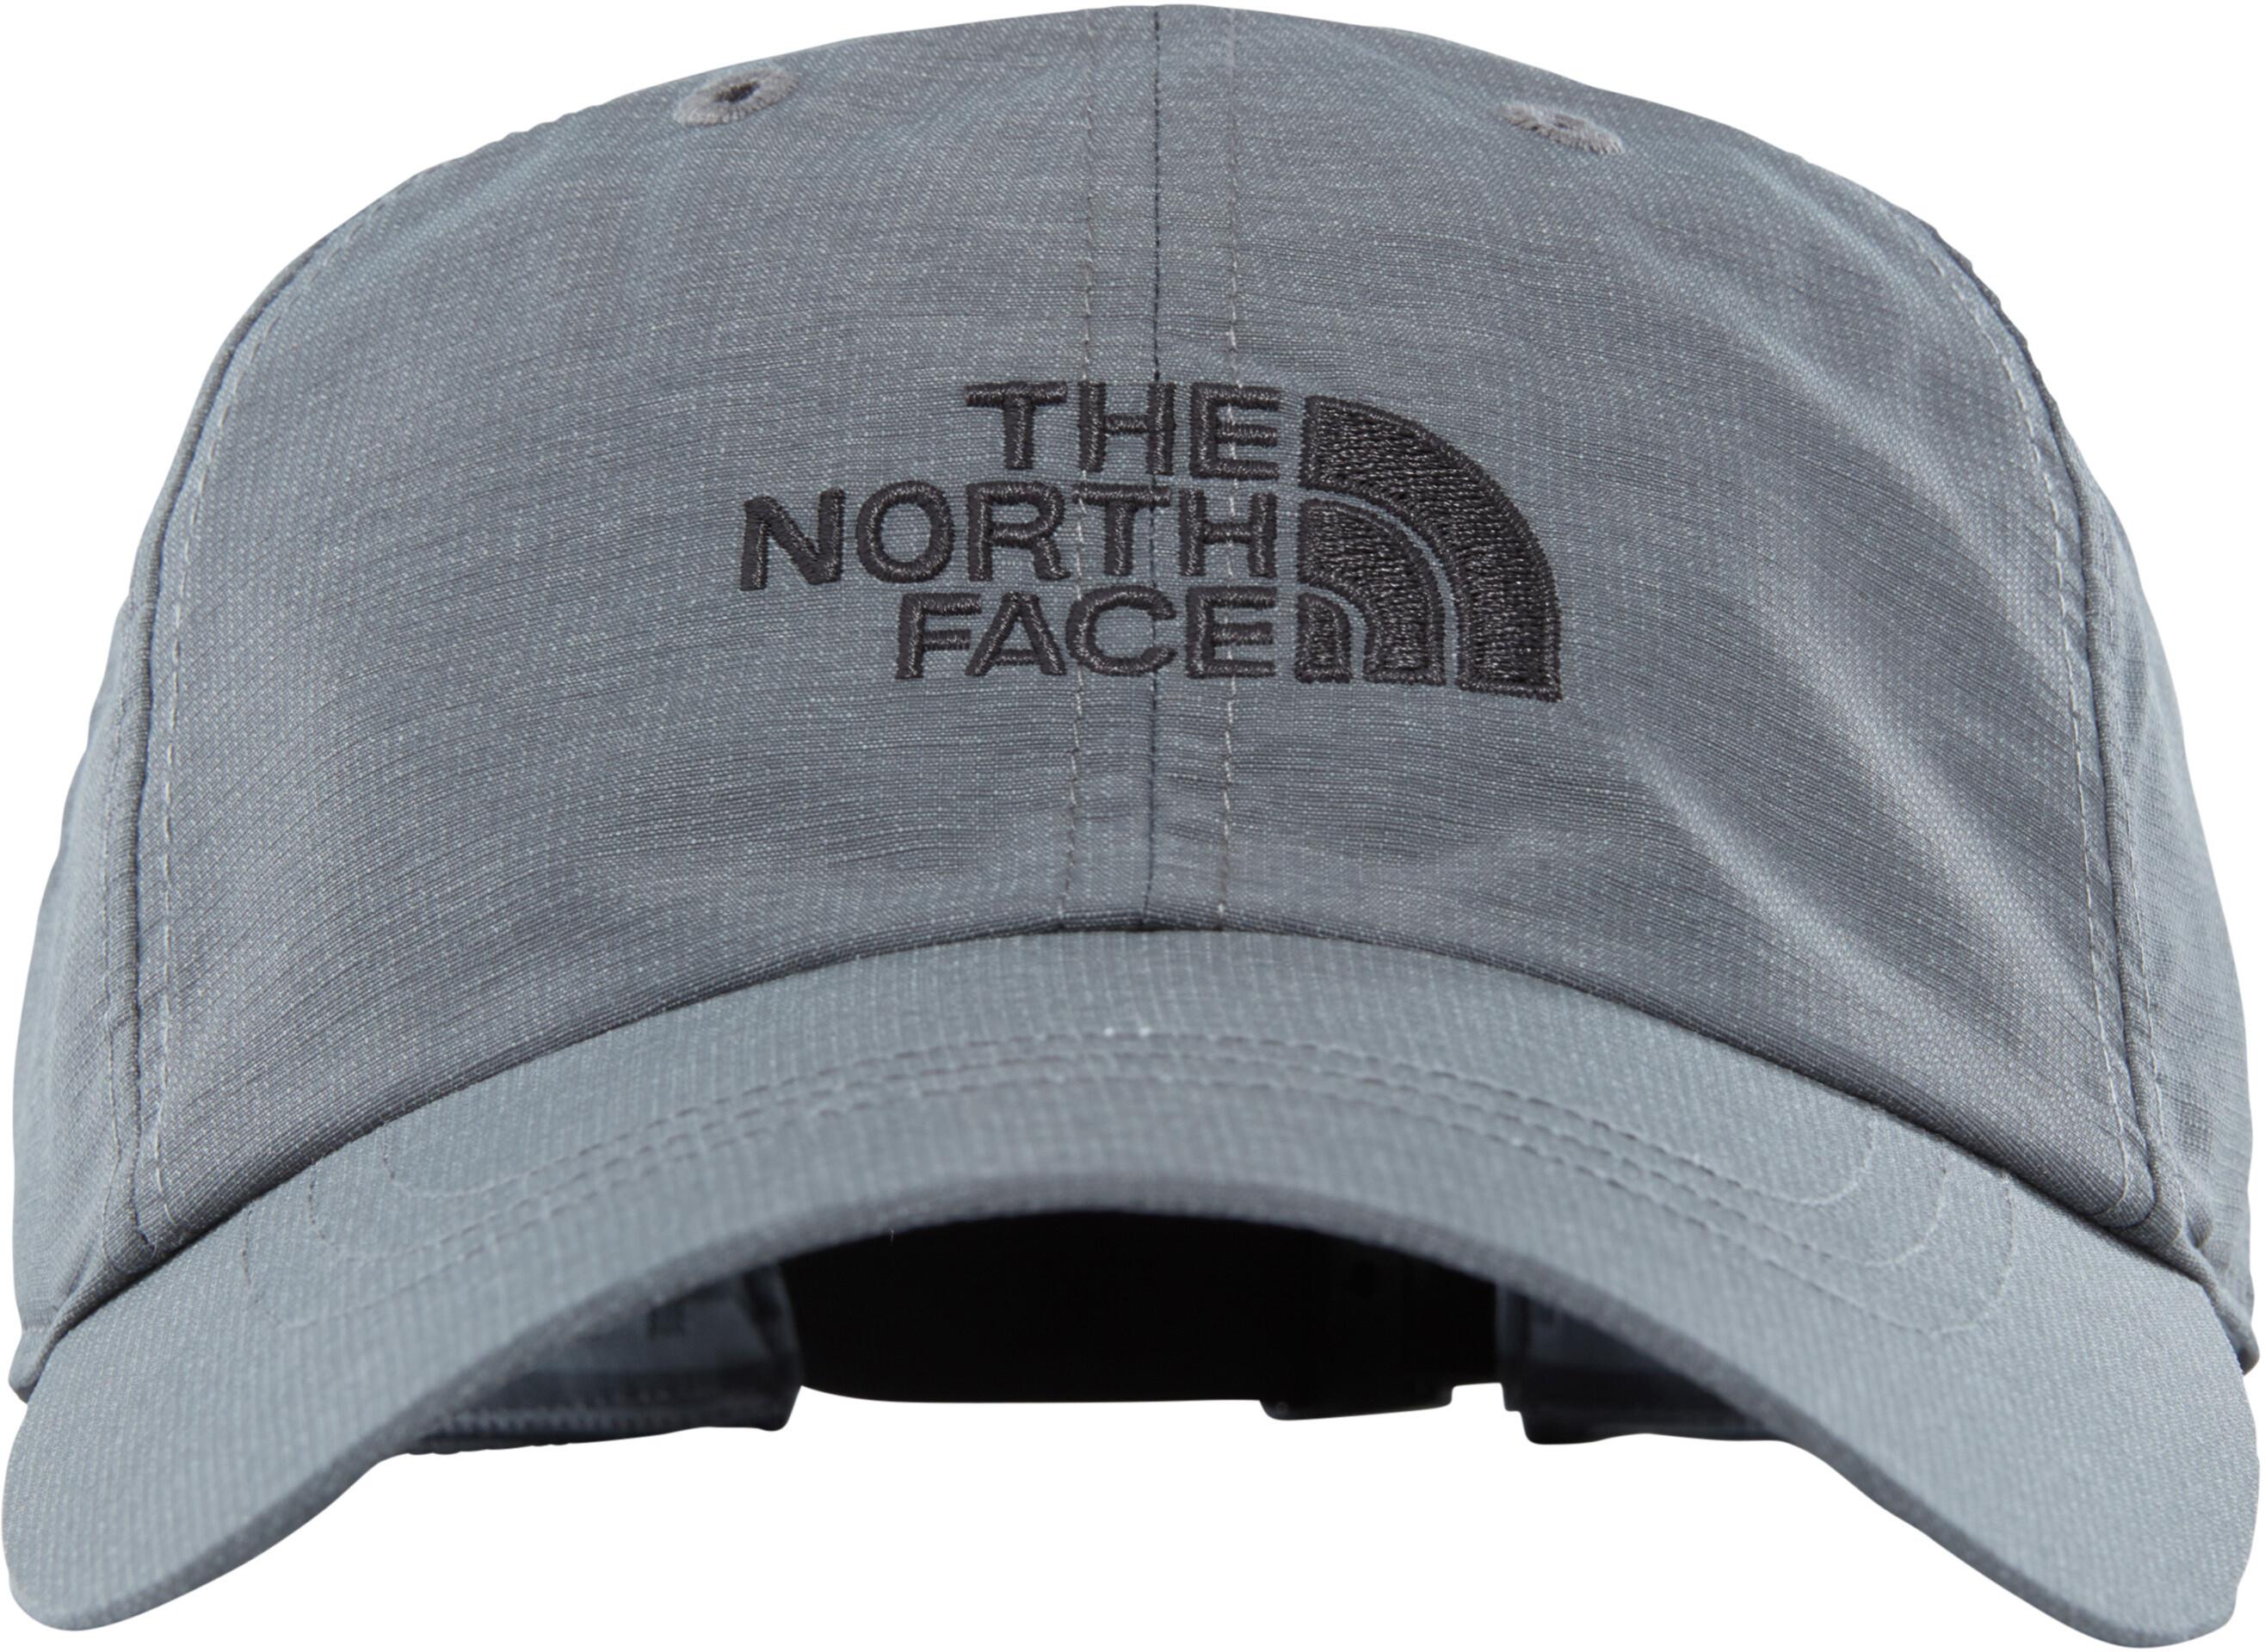 cfc7b2c3c7c The North Face Horizon Headwear grey at Addnature.co.uk